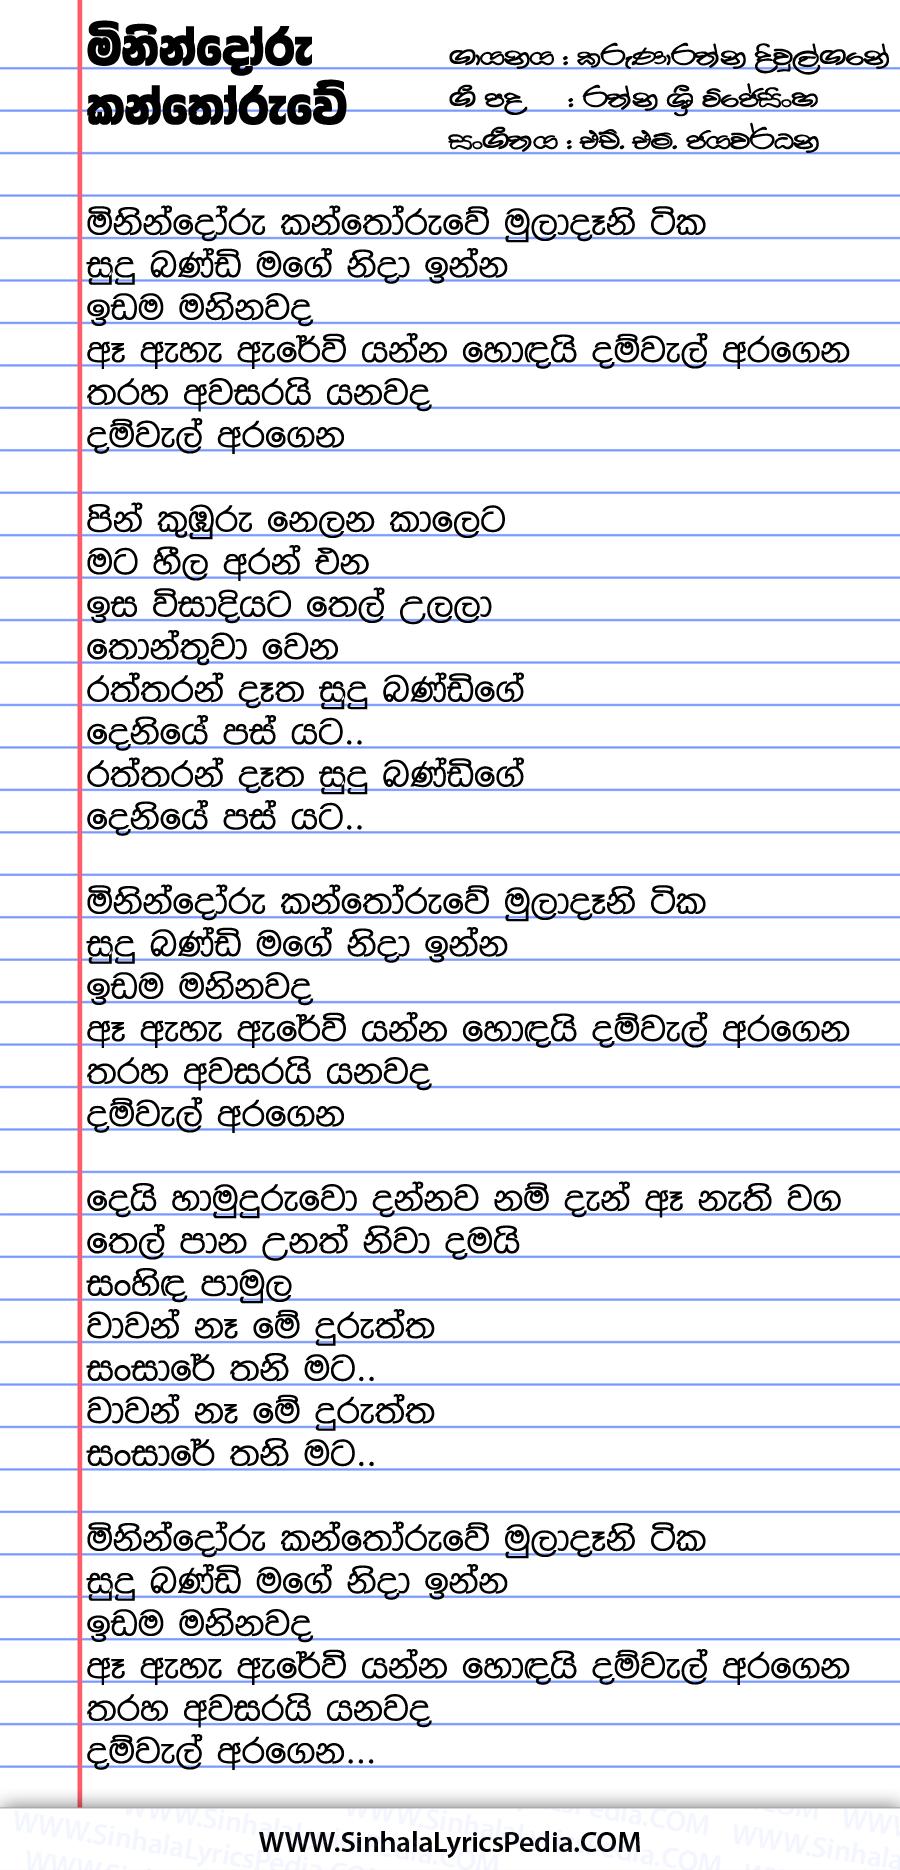 Minindoru Kanthoruwe Muladani Tika Song Lyrics